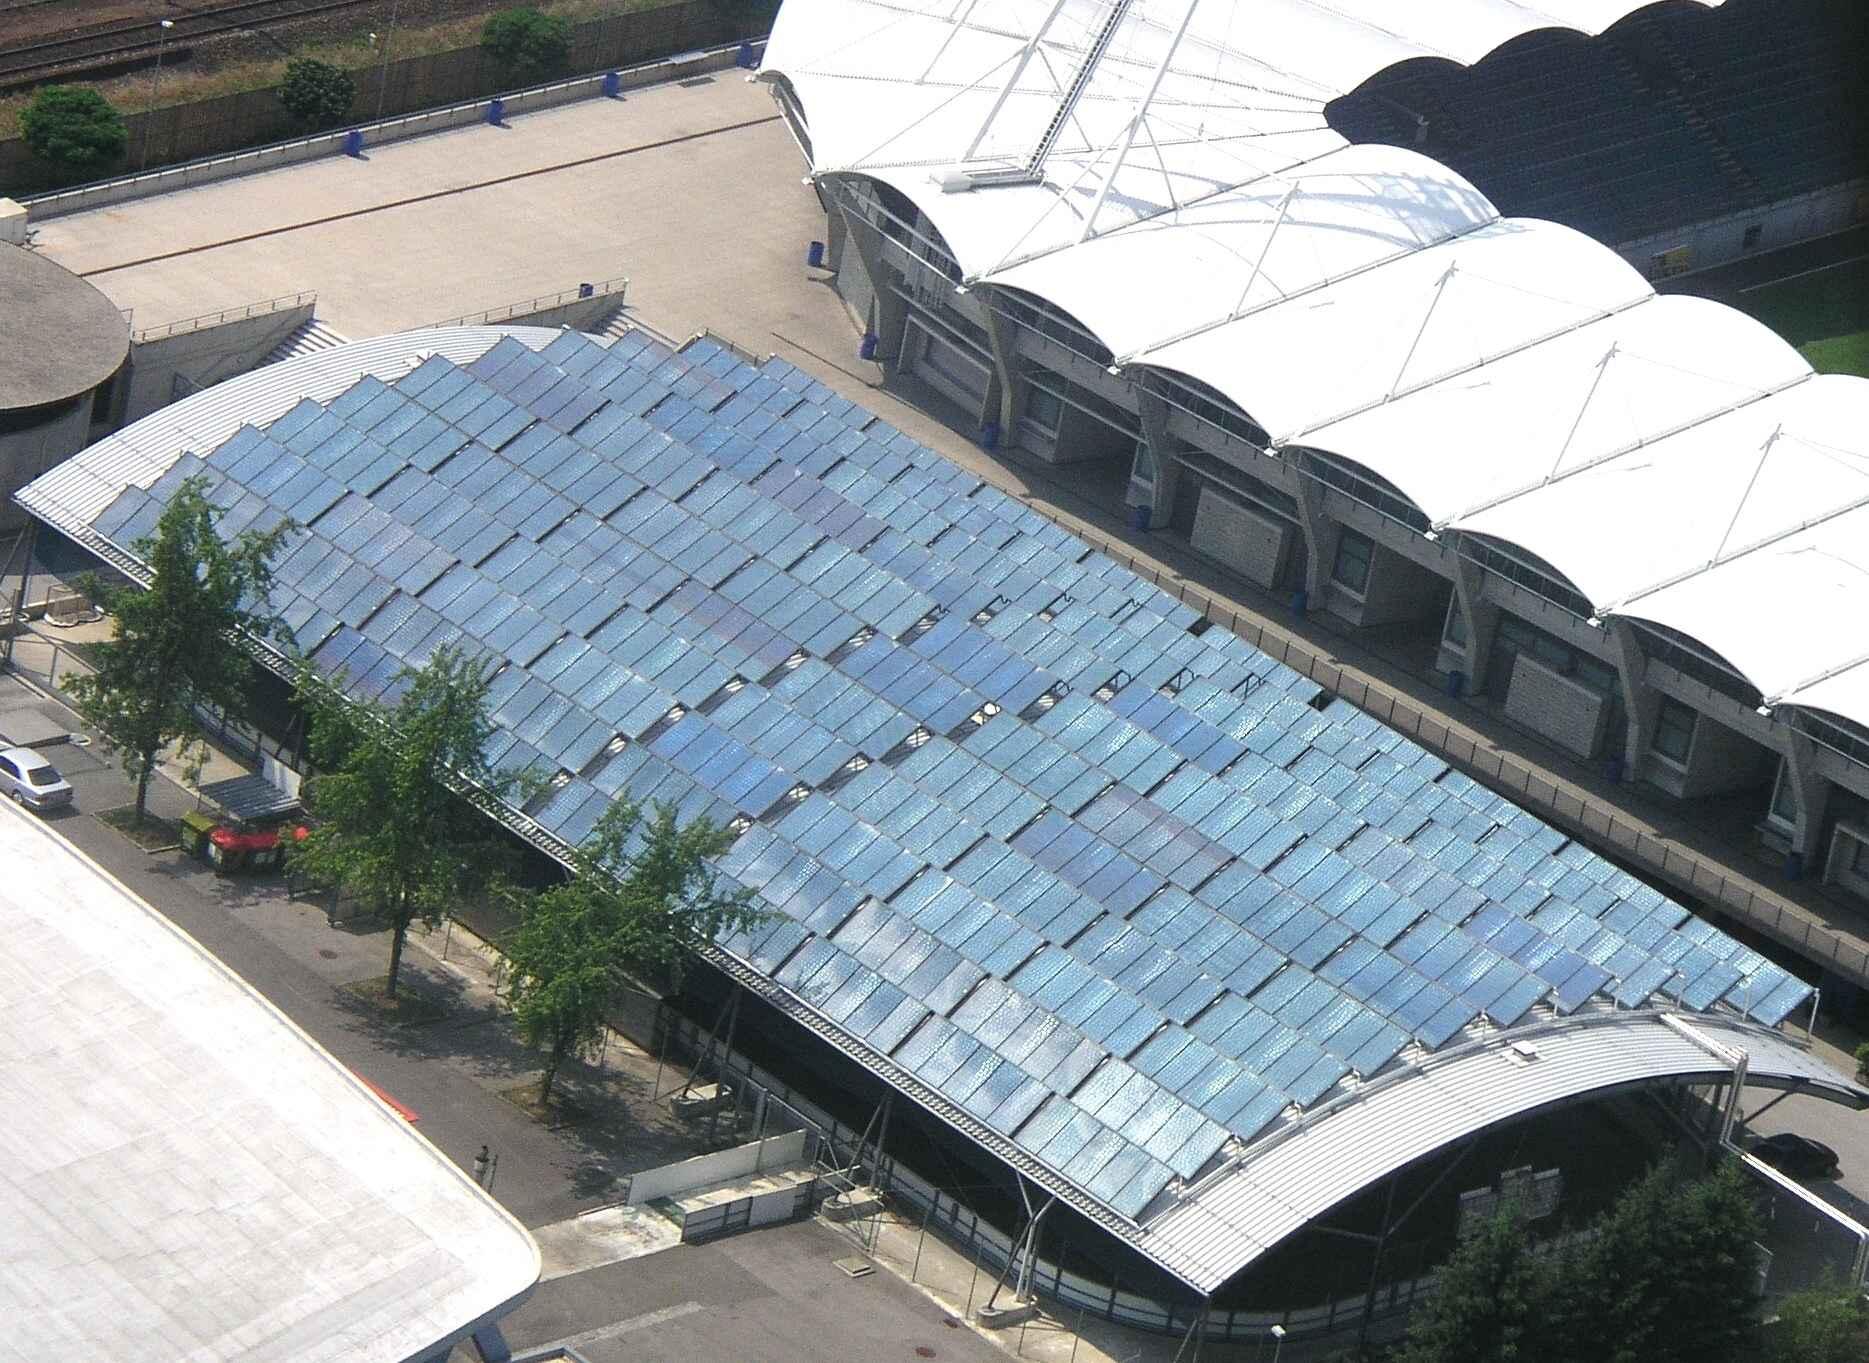 S.O.L.I.D Solar Heat Europe – Collector field for district heating, Schwarzenegger arena, Graz, Austria